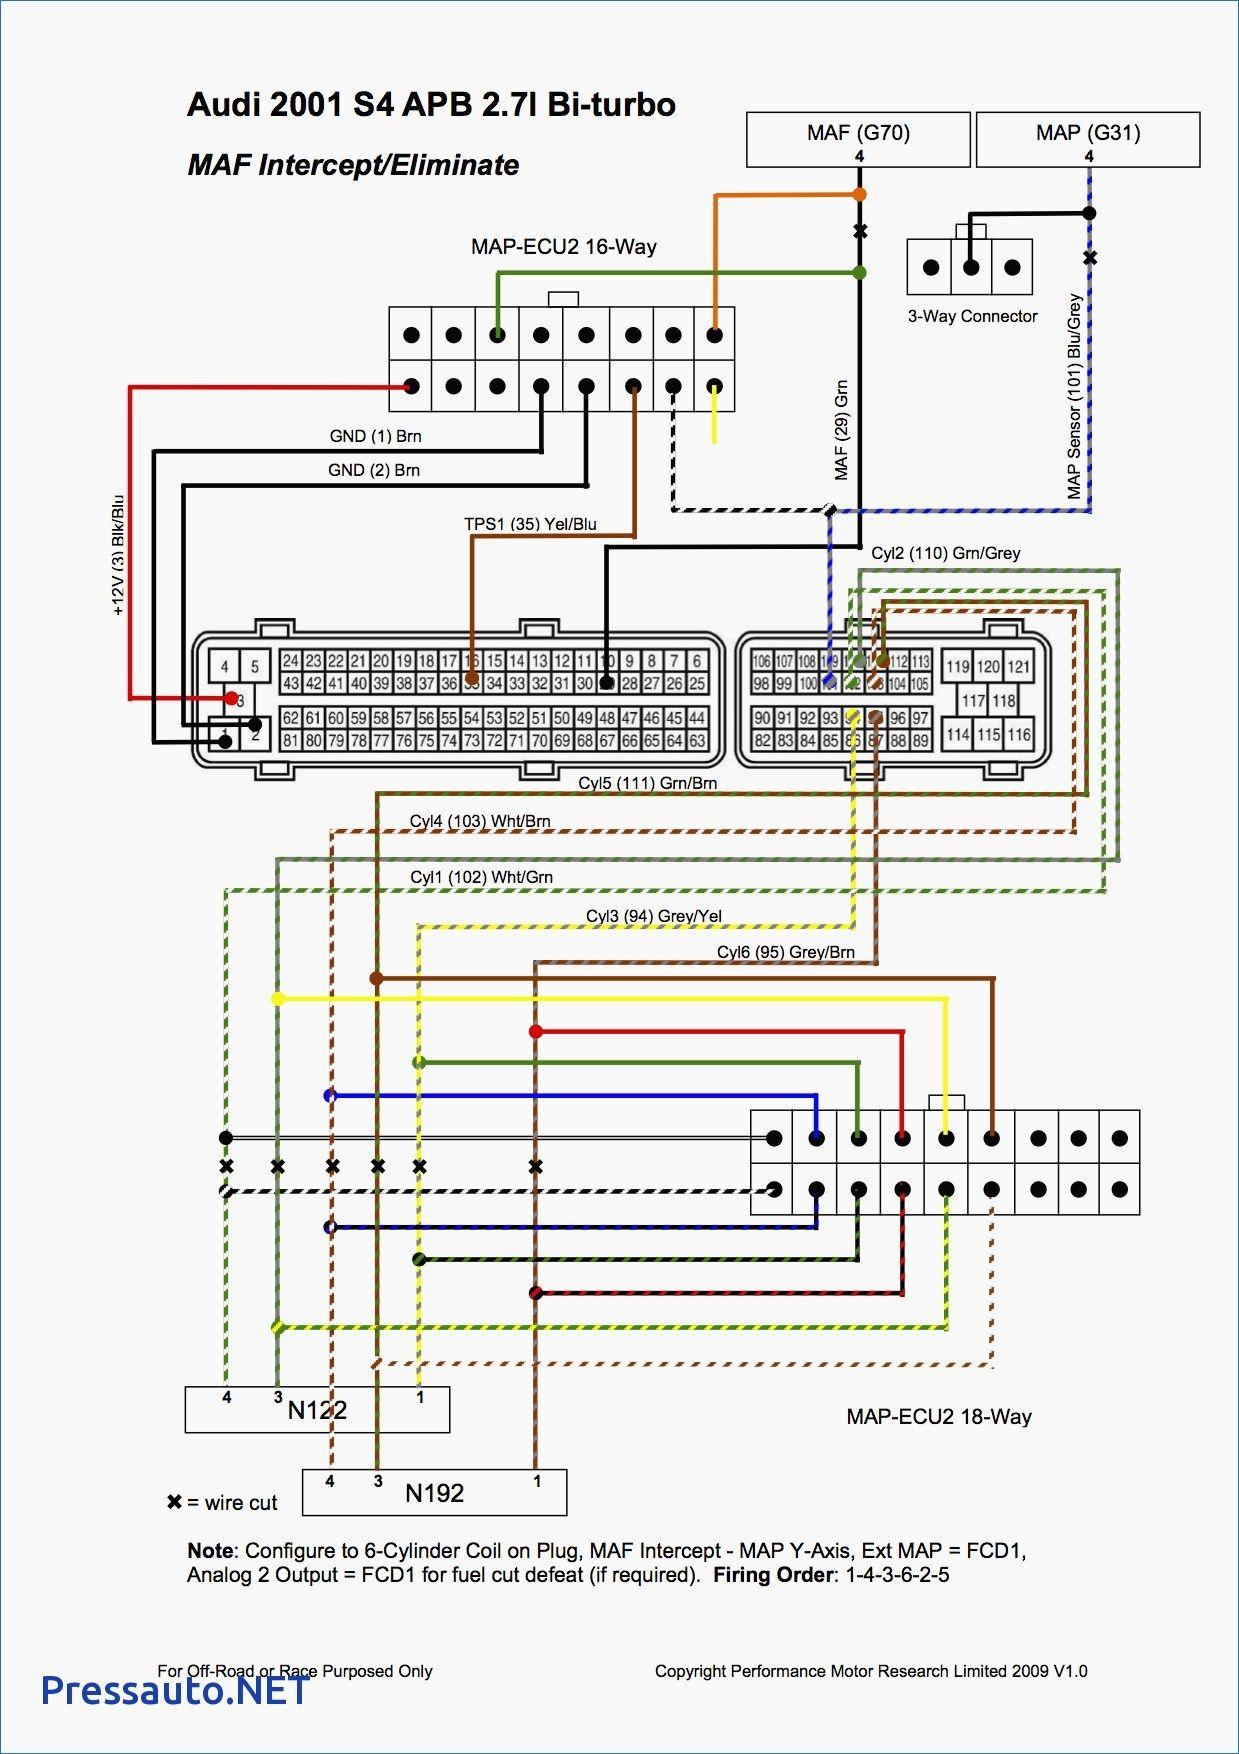 1996 pontiac radio wiring diagram | site wiring diagrams campaign  wiring diagram library